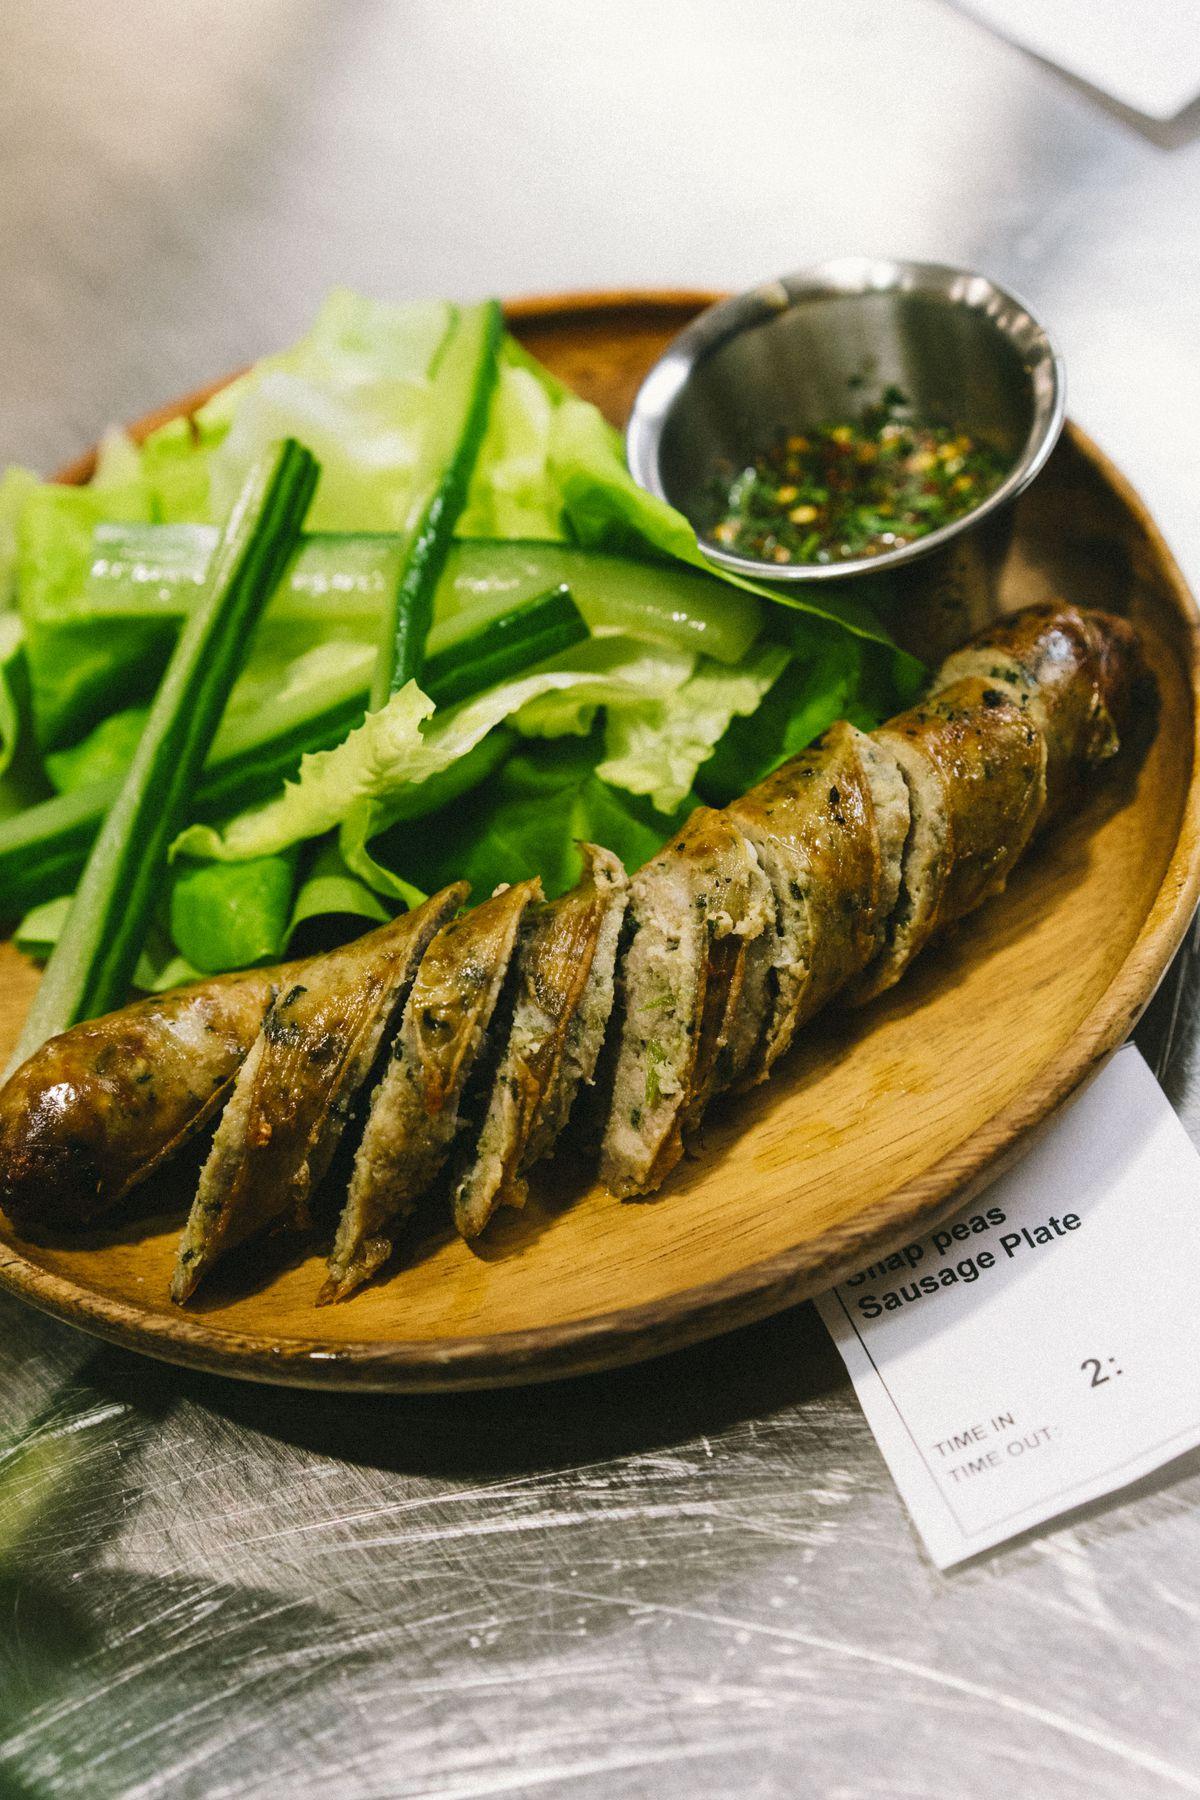 Loro's green curry pork sausage plate